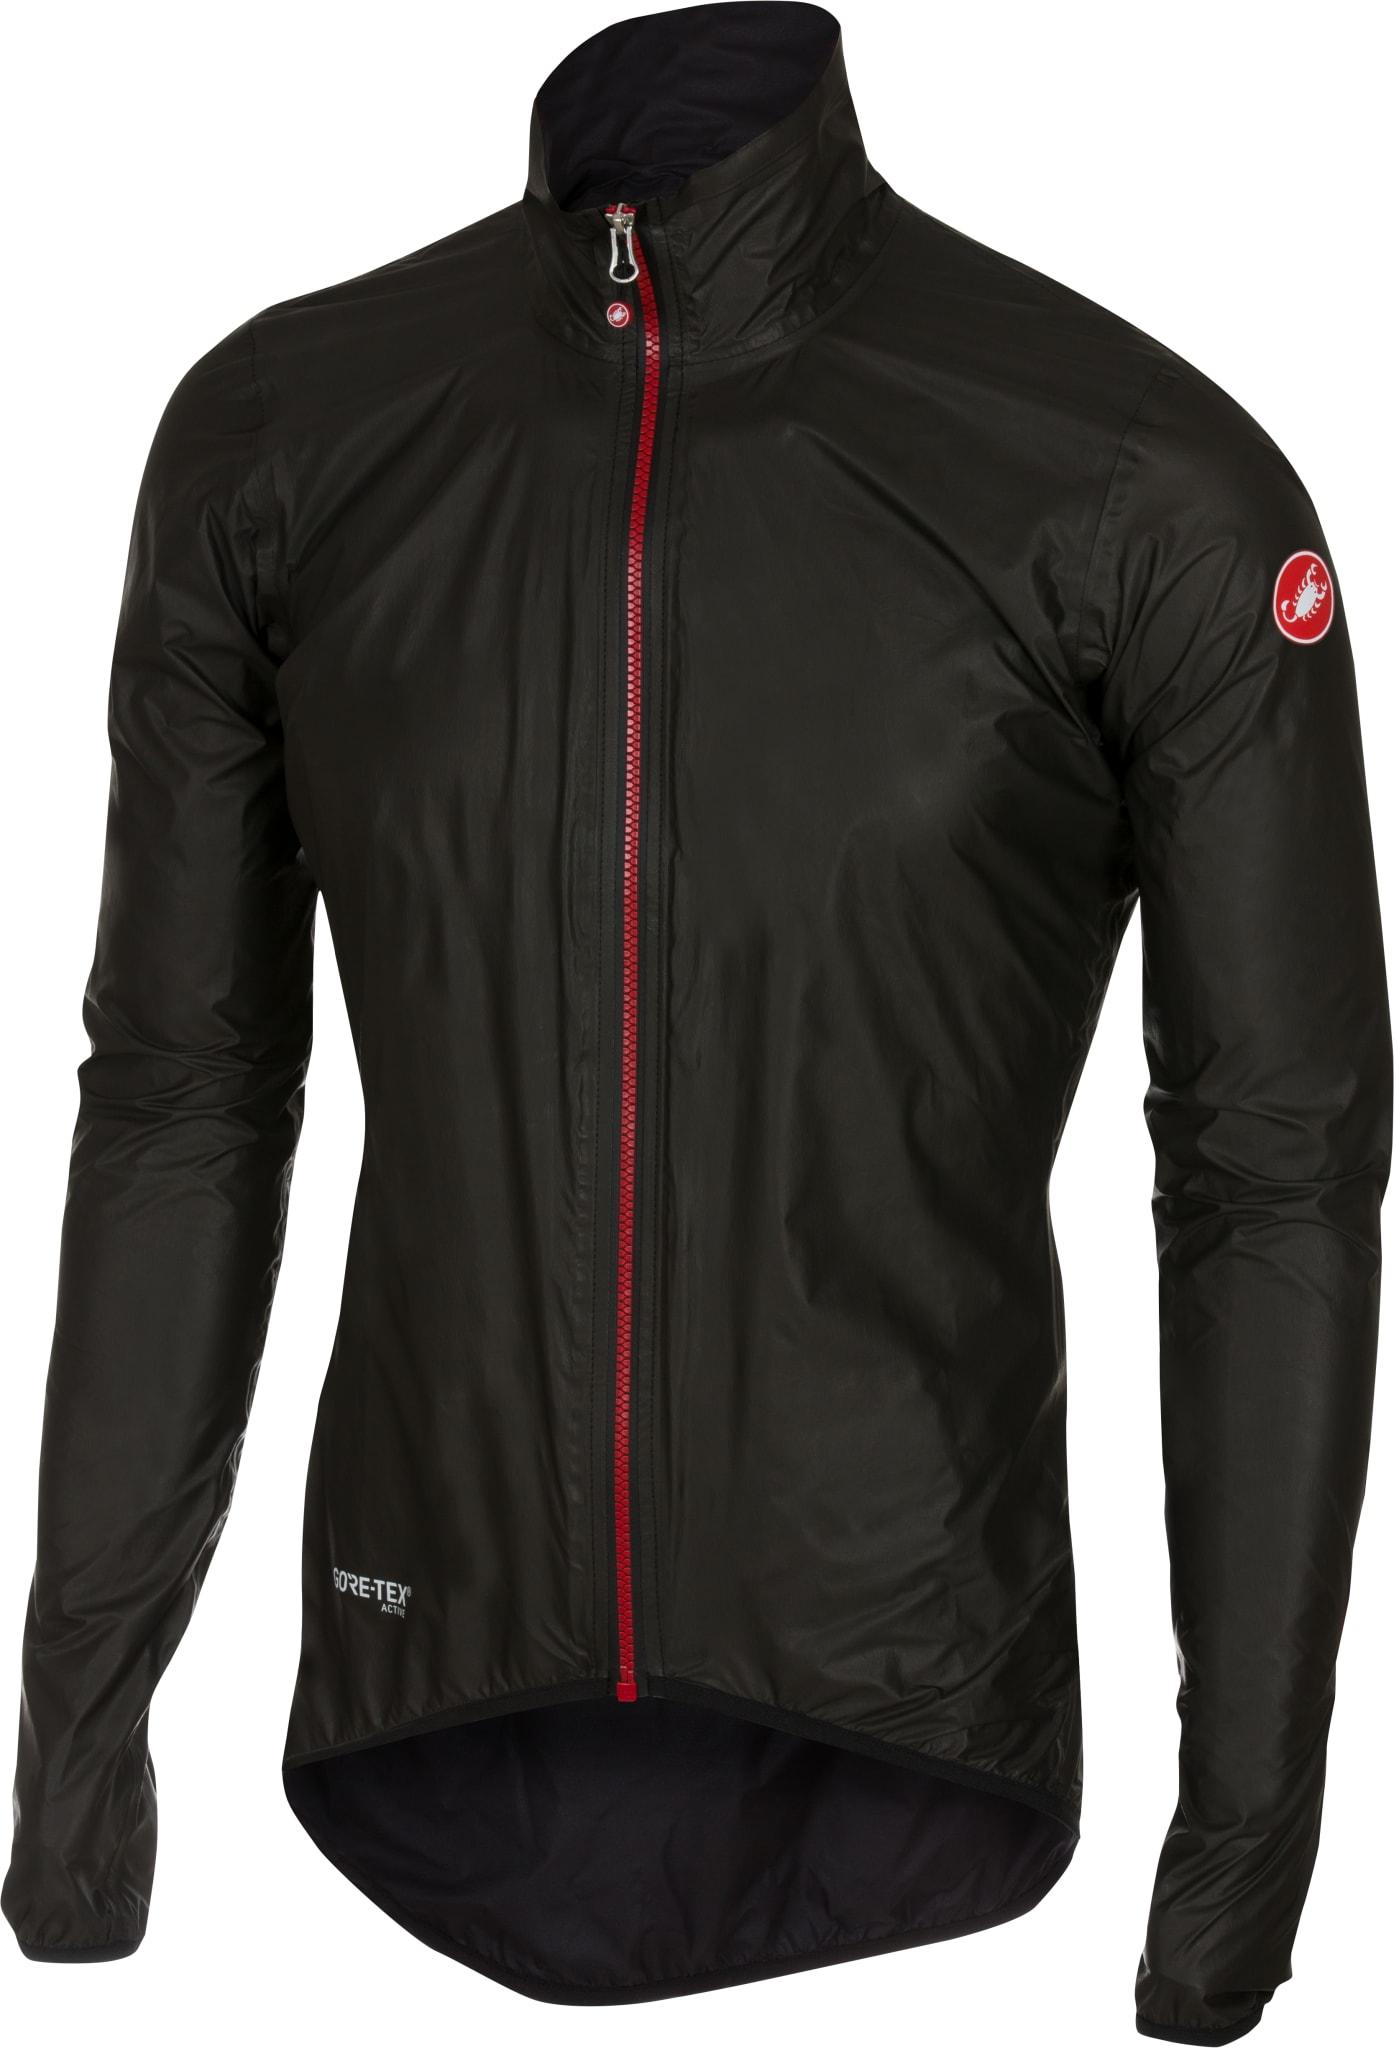 Idro 2 Jacket